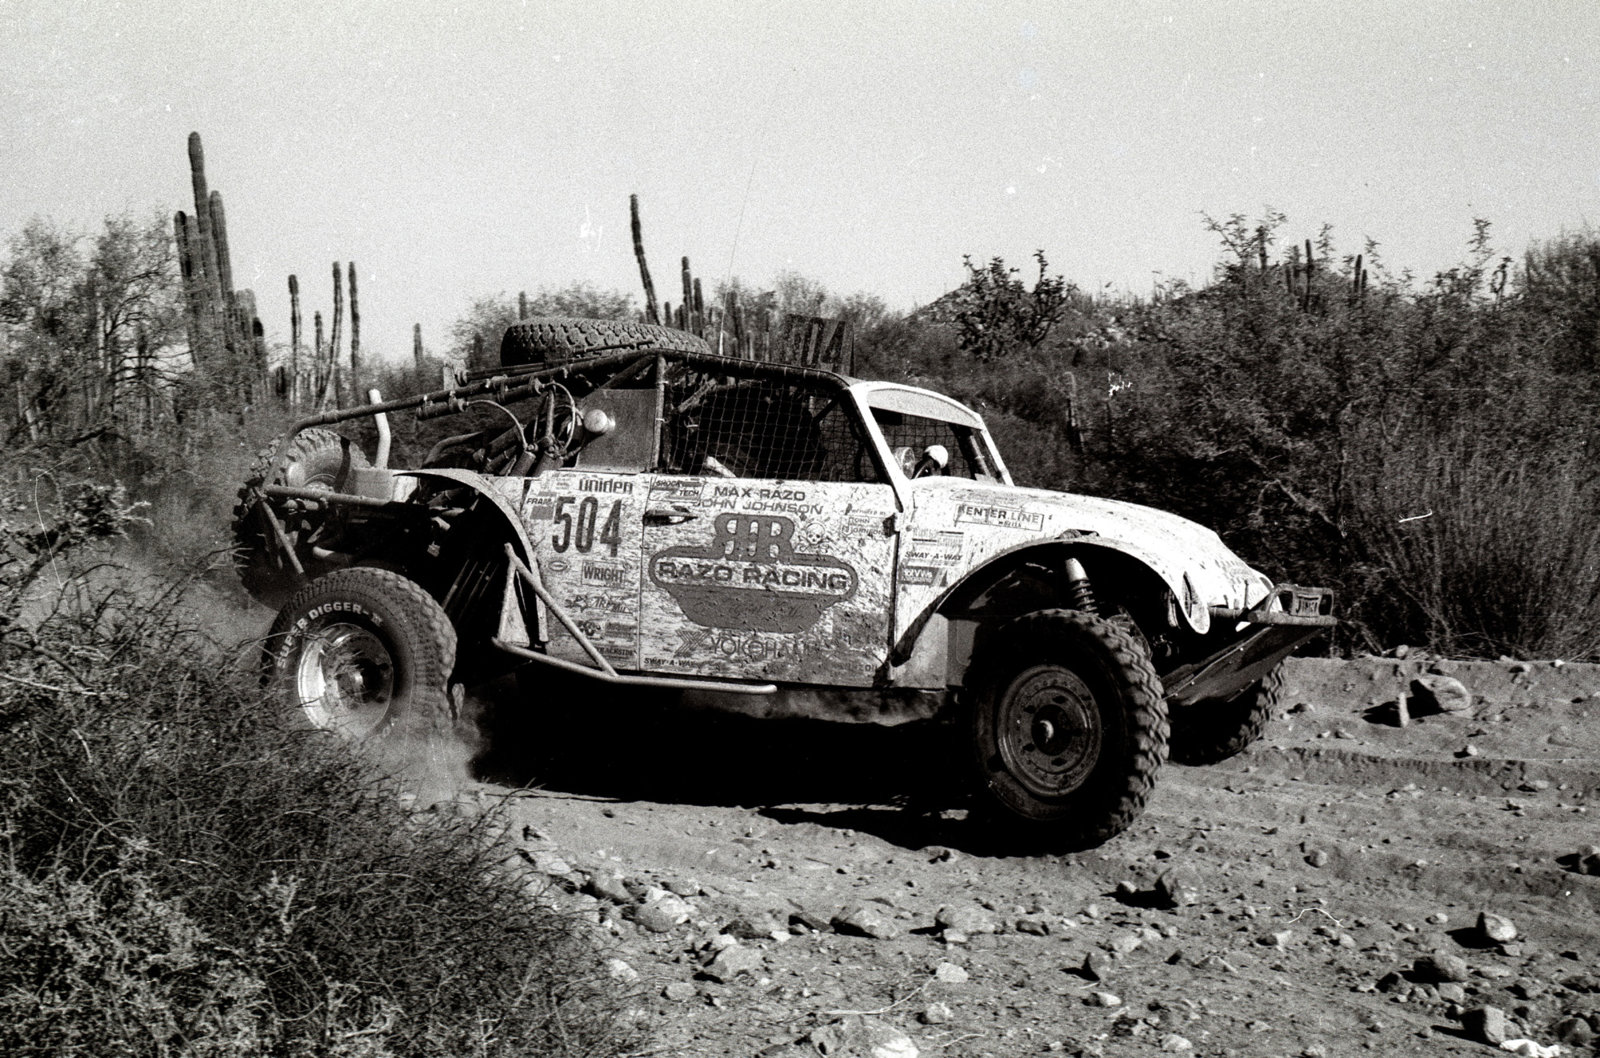 CenterlineImages.1986. Baja 1000. 504. Razo. Johnson. 1st class.21x.jpg